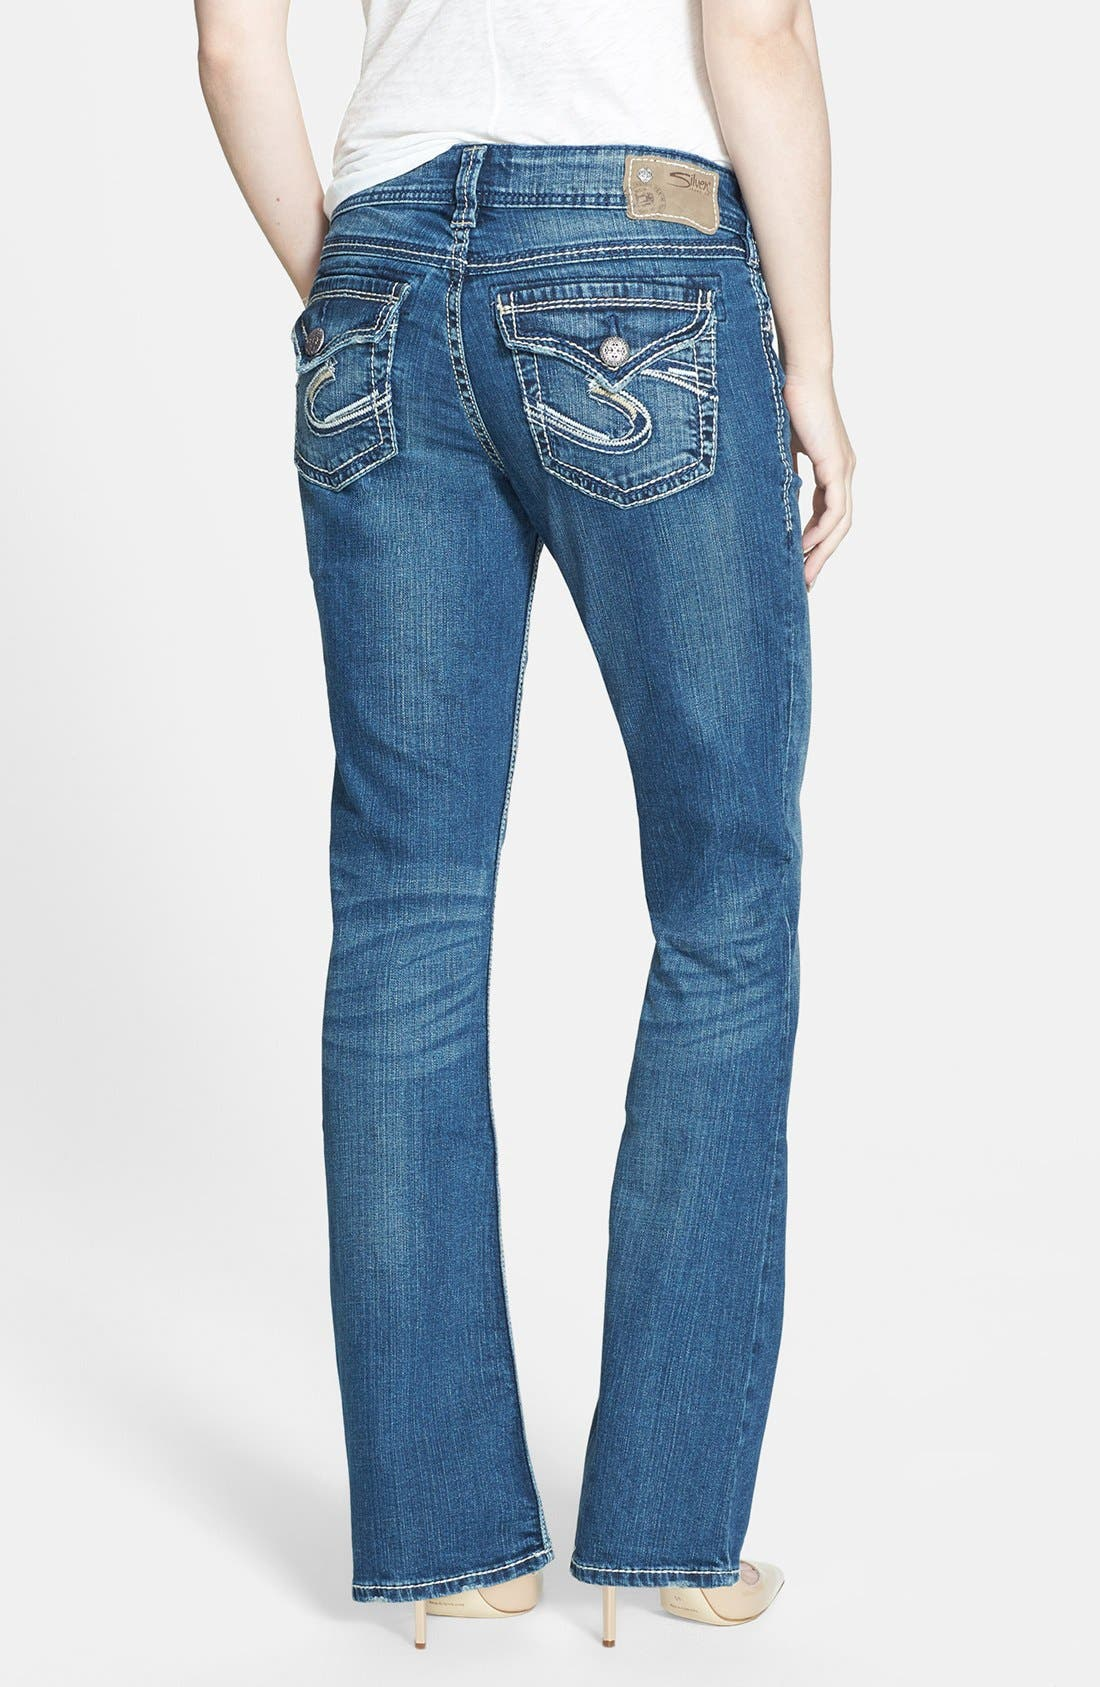 Alternate Image 2  - Silver Jeans Co. 'Suki' Stretch Bootcut Jeans (Indigo)